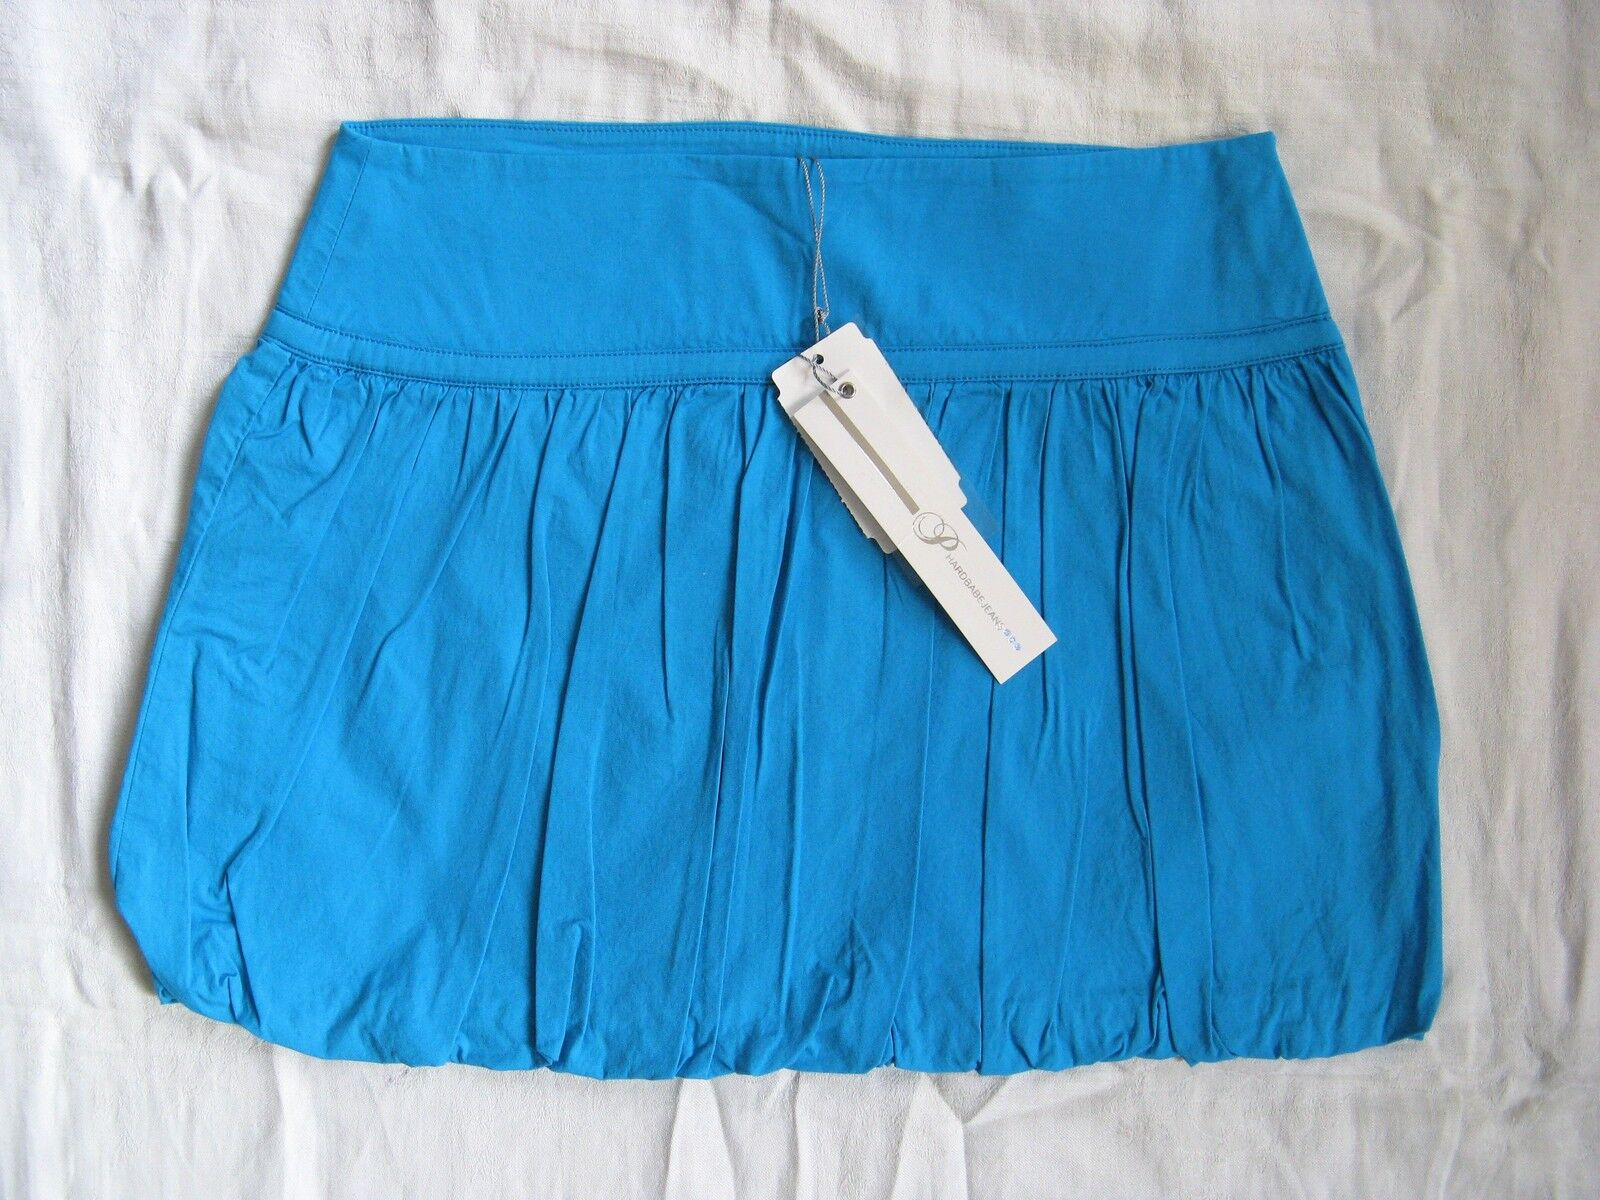 Phard Babe Ladies Mini Skirt Stretch W28 Size S/38 Women Skirt Normal Waist Lycra